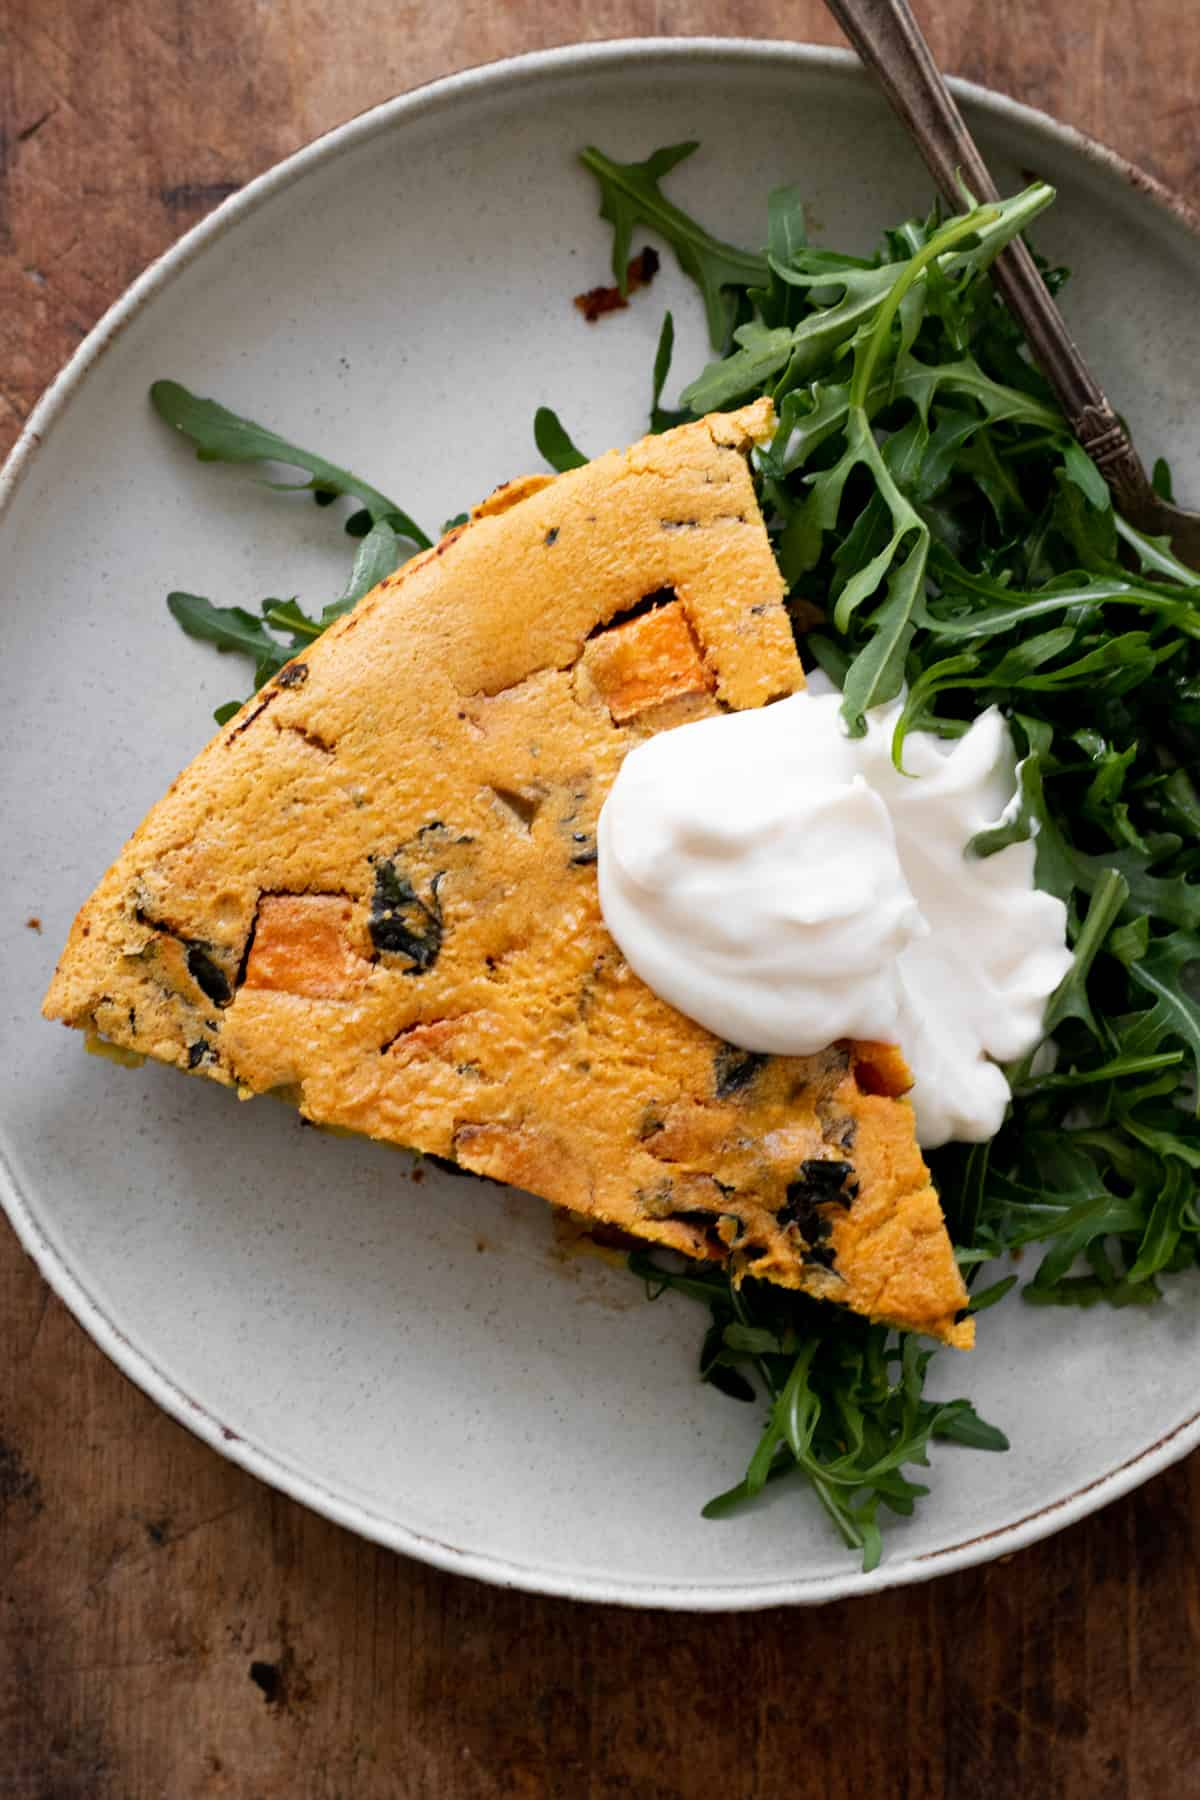 Frittata slice over arugula on gray plate.